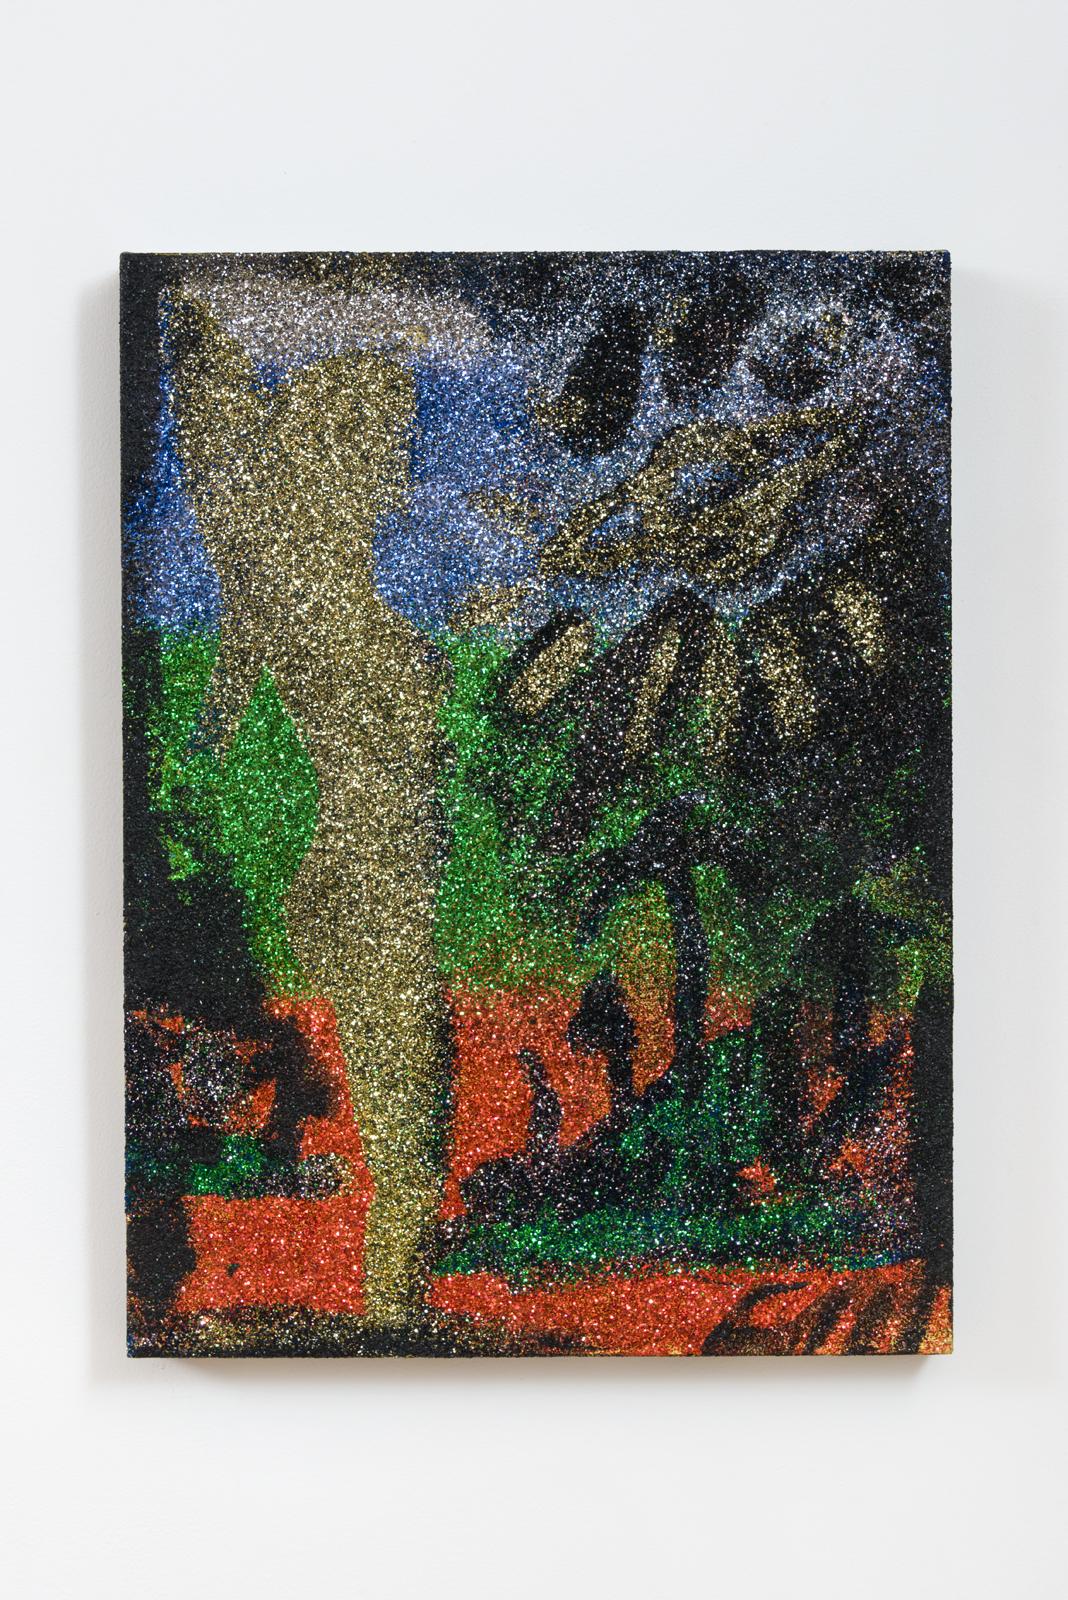 Chris Martin  Islands #2 ,2015 acrylic and glitter on canvas 24 x 18 x 2 in. Courtesy of David Kordansky Gallery, Los Angeles, CA